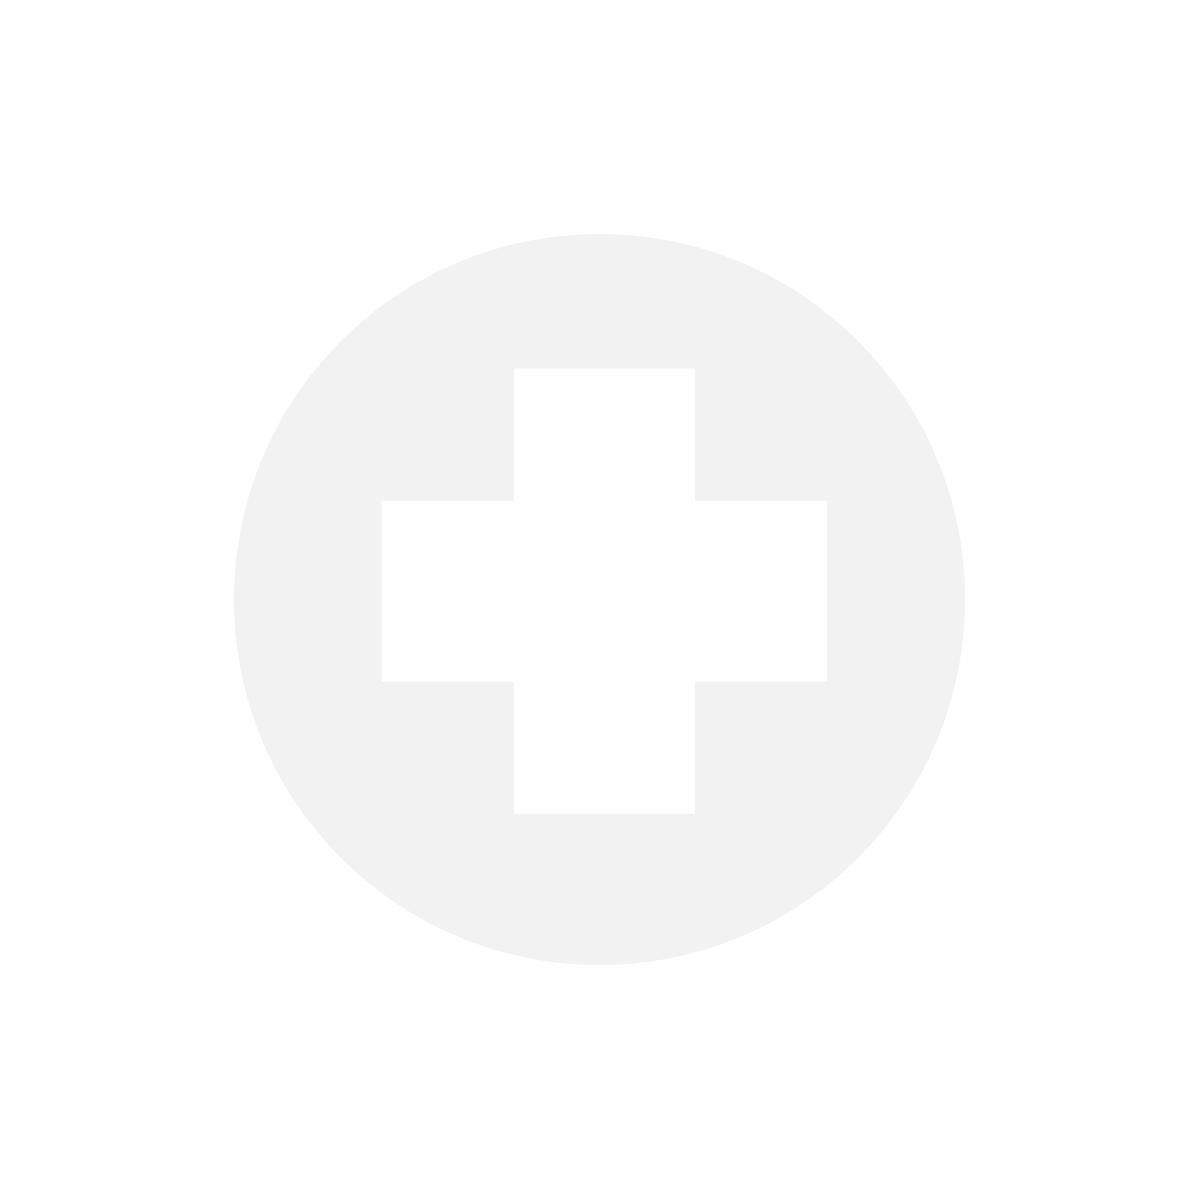 SONIC VITAL - Tête 4cm²